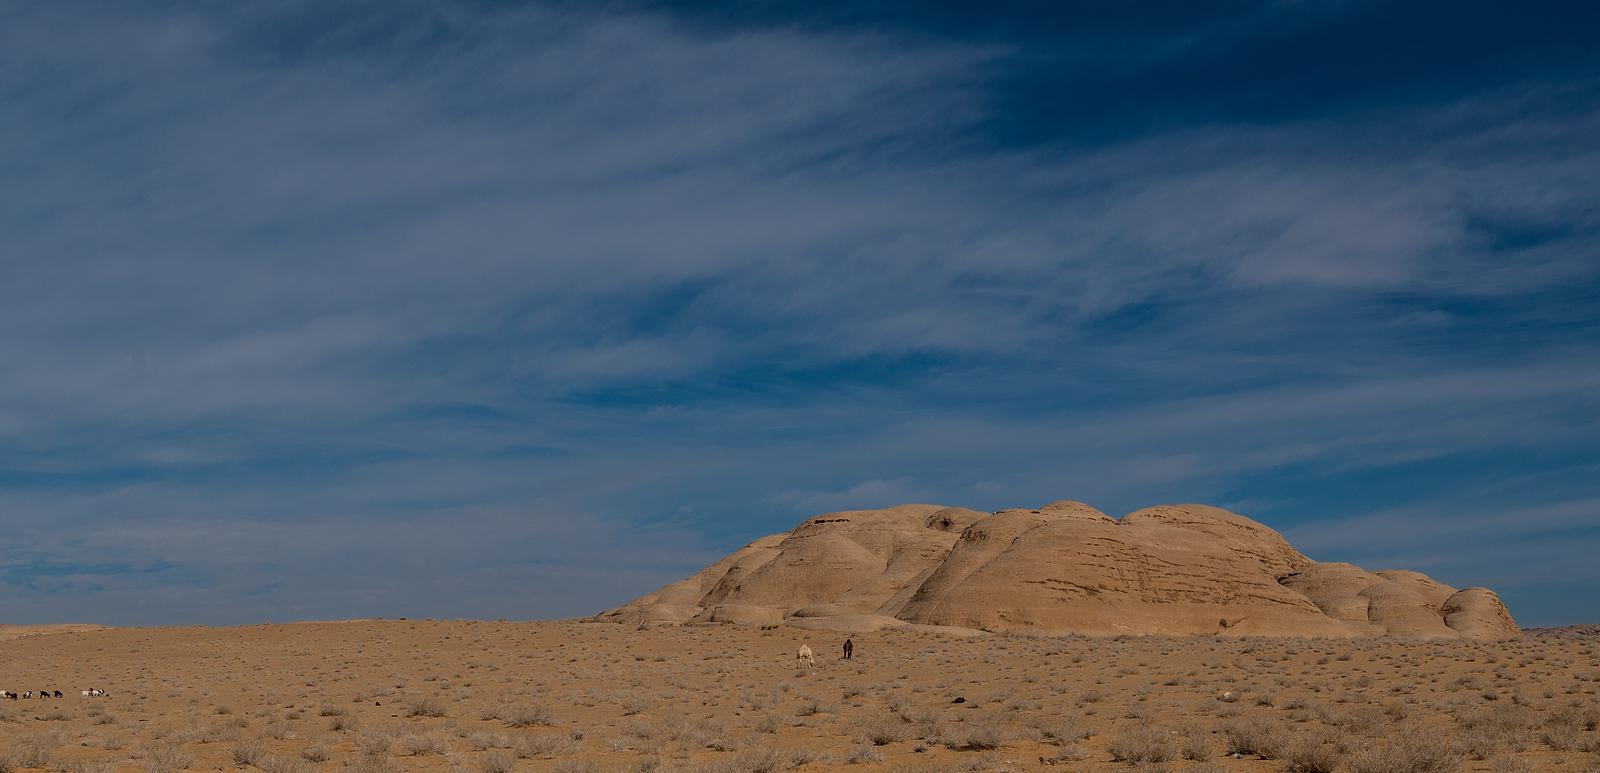 Camels in the desert, Jordan